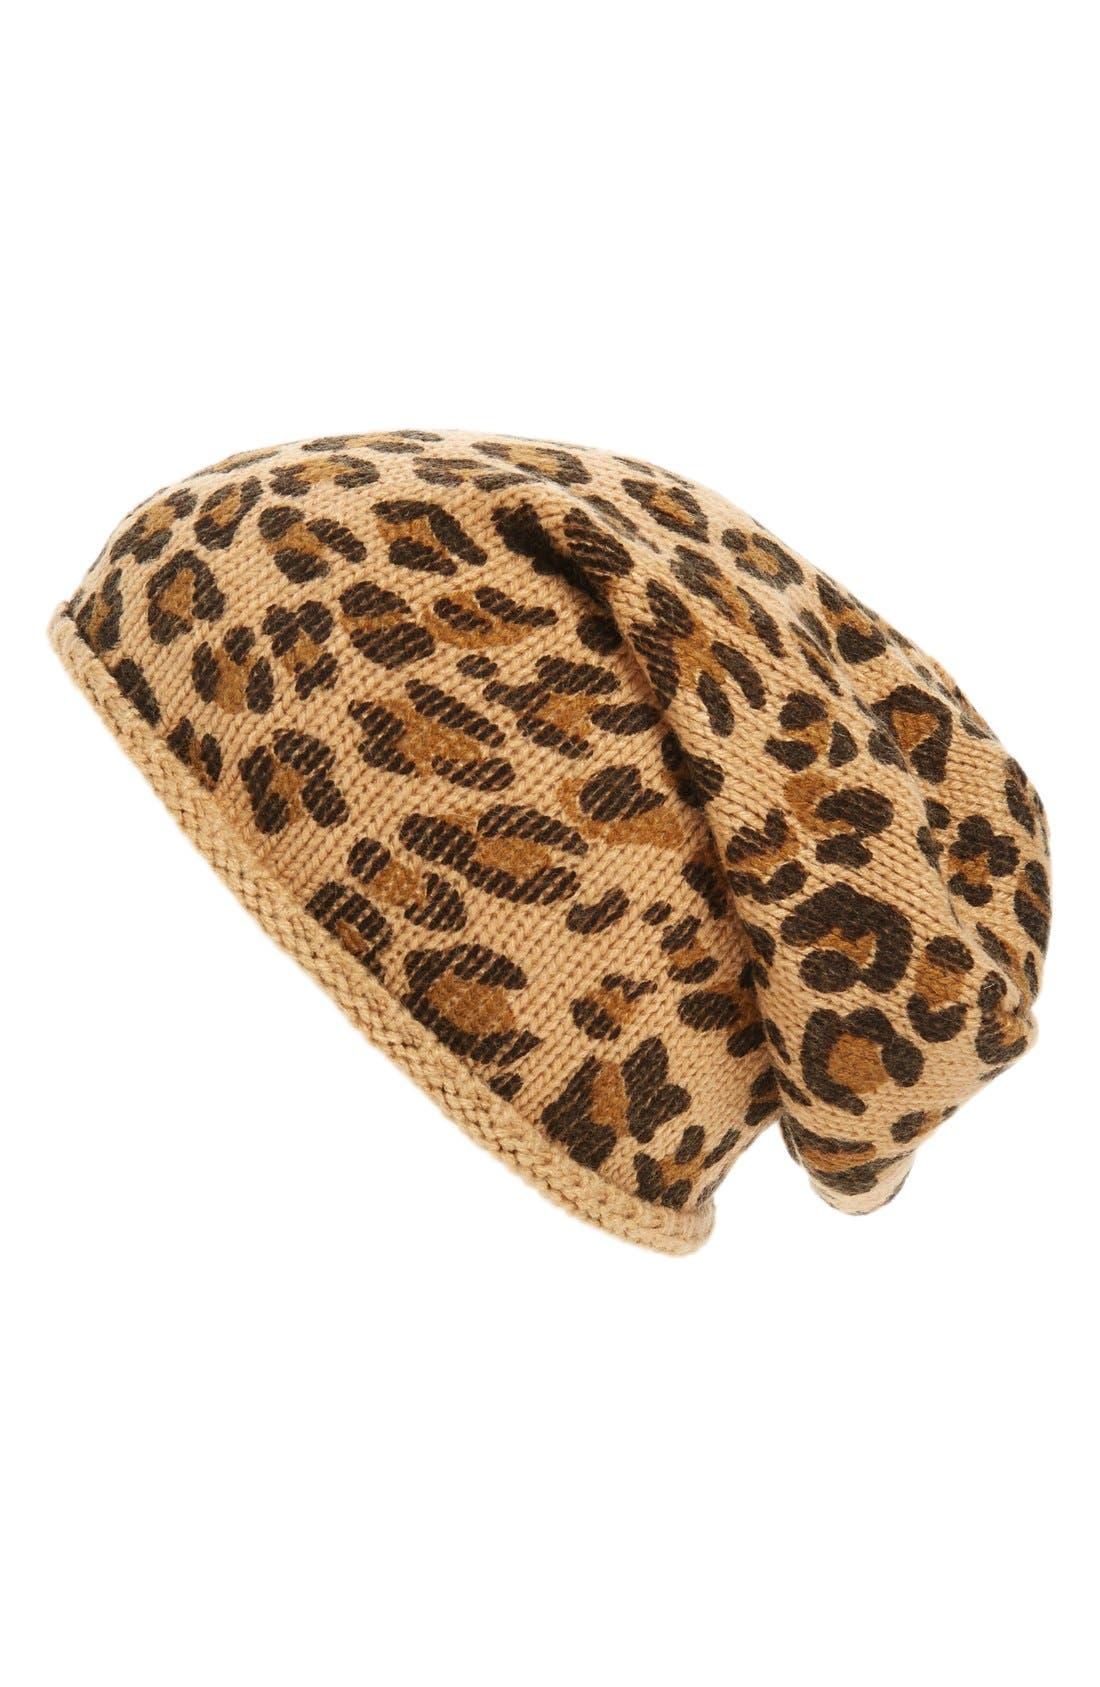 Leopard Print Slouchy Beanie,                         Main,                         color, Camel